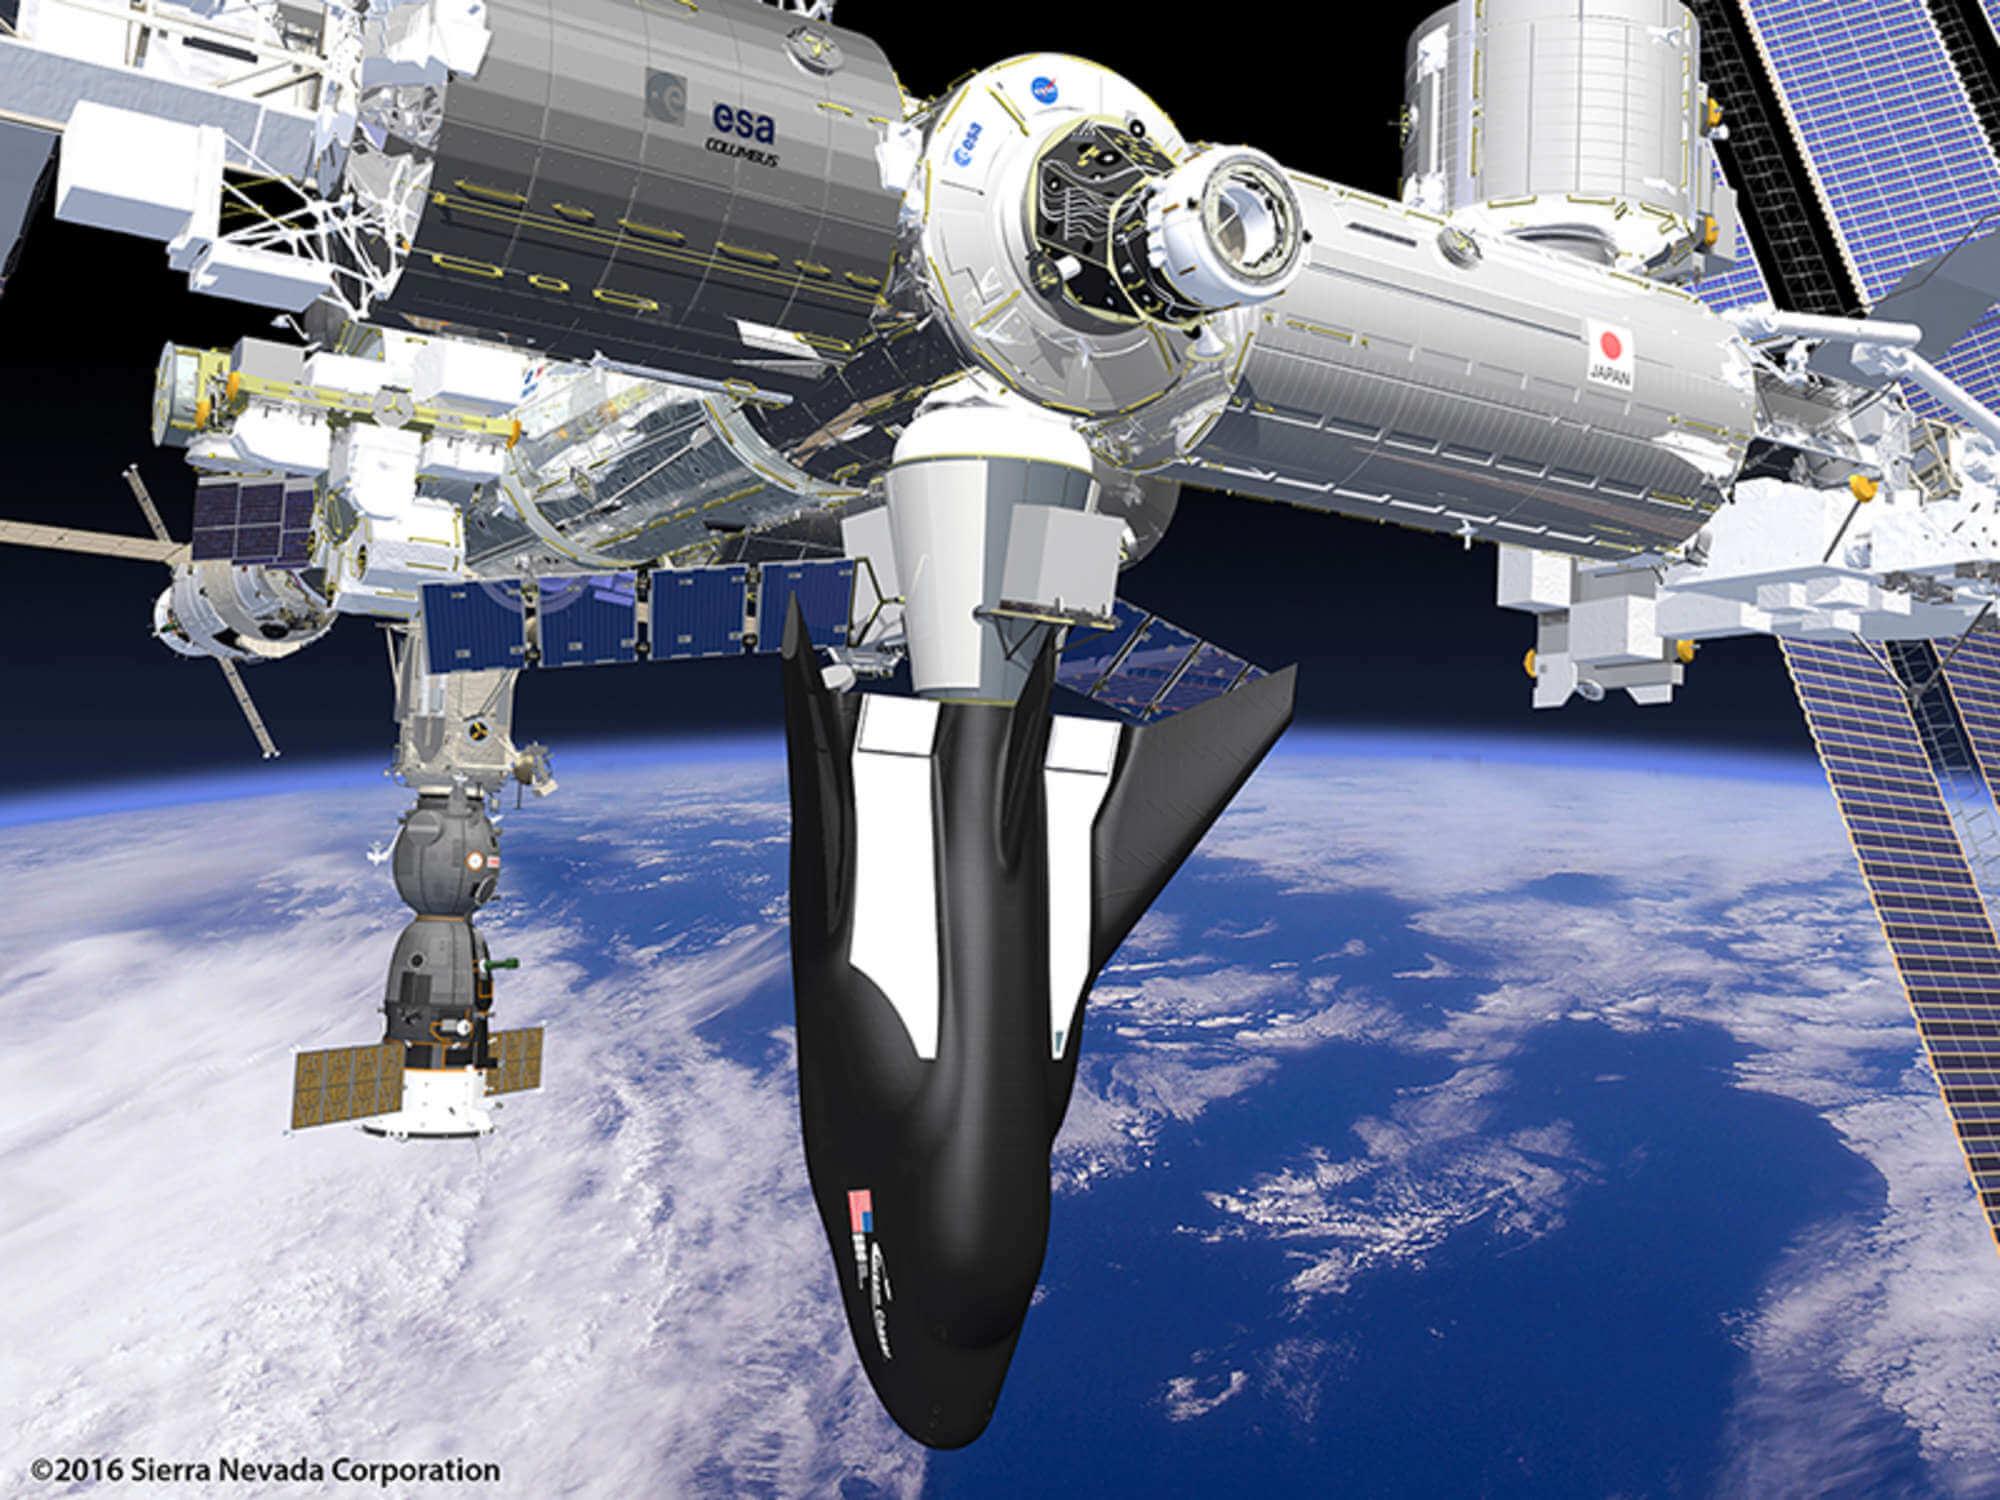 Sierra Nevada полетит к МКС, но у NASA нет четкого плана по Марсу